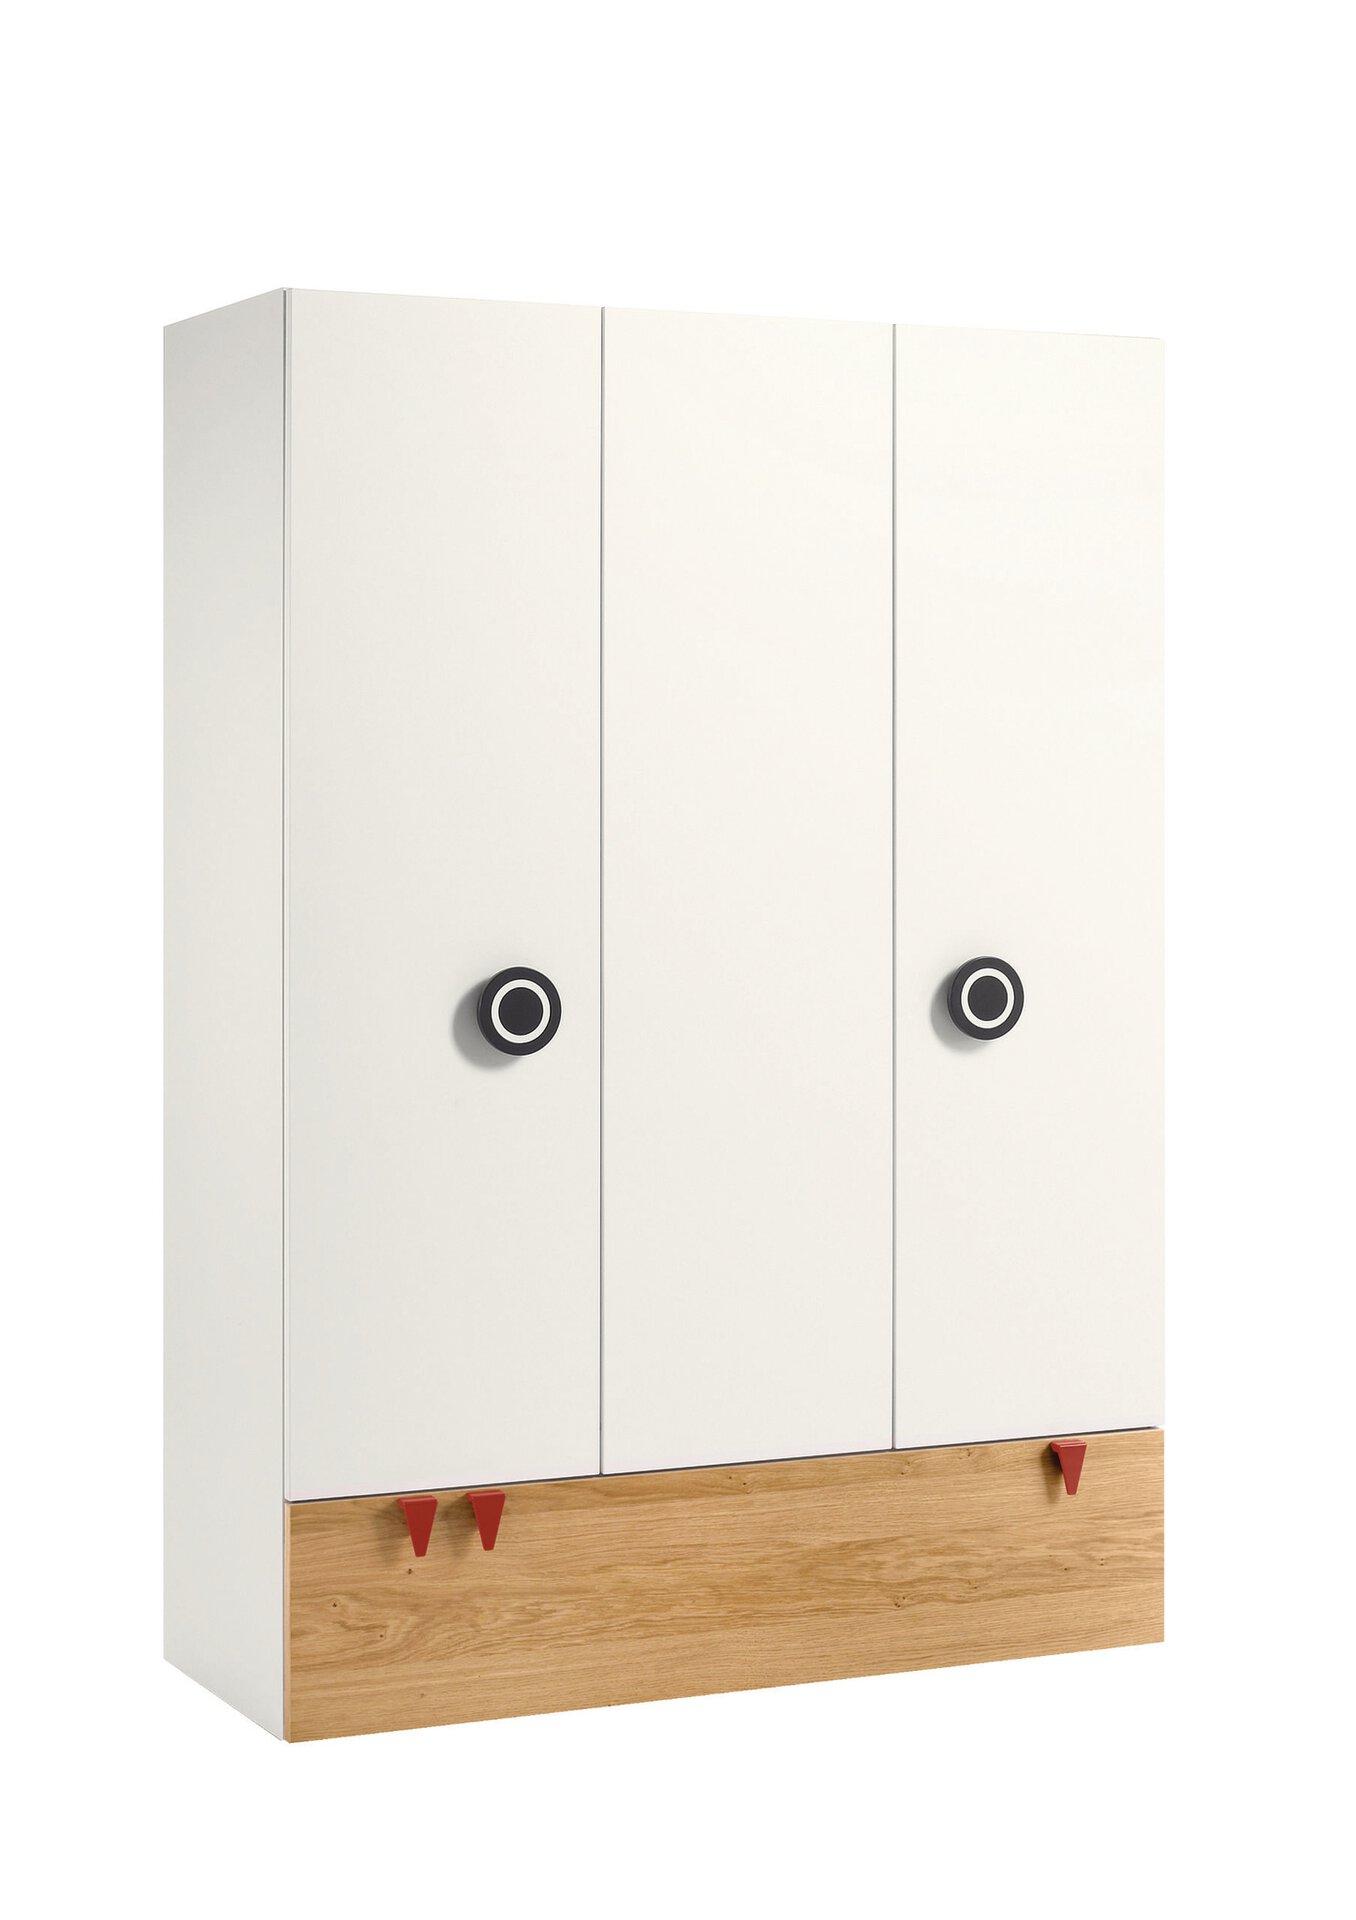 Kinderschrank MINIMO now! by Hülsta Holzwerkstoff weiß 53 x 194 x 135 cm